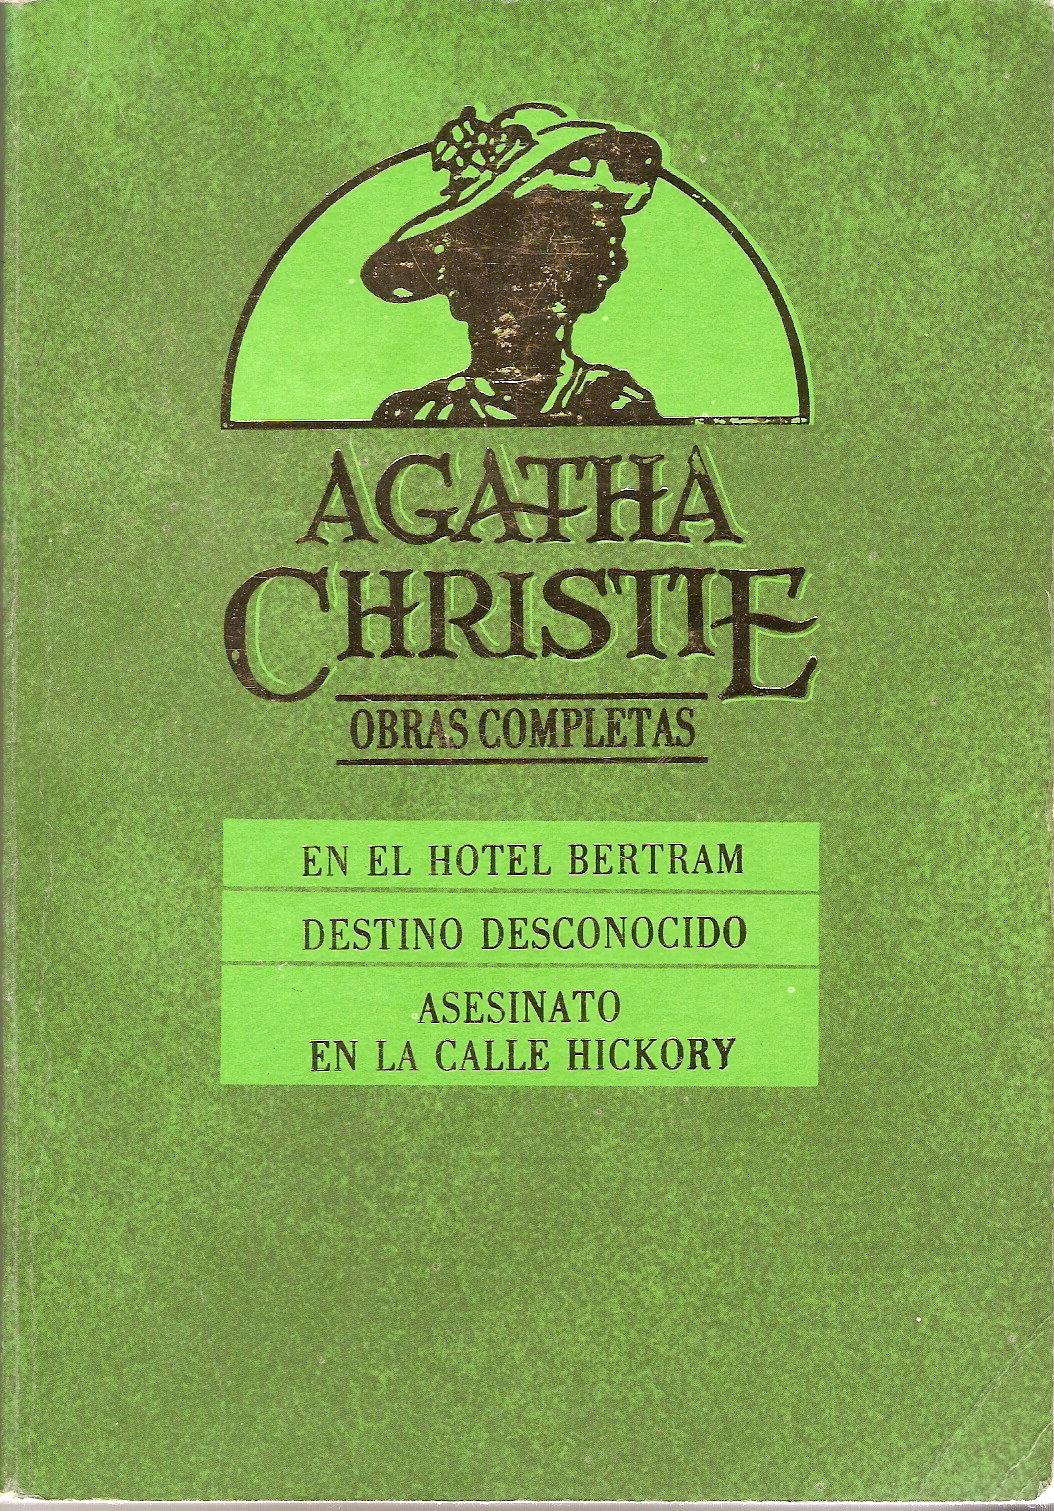 Agatha Christie Obras Completas XVII